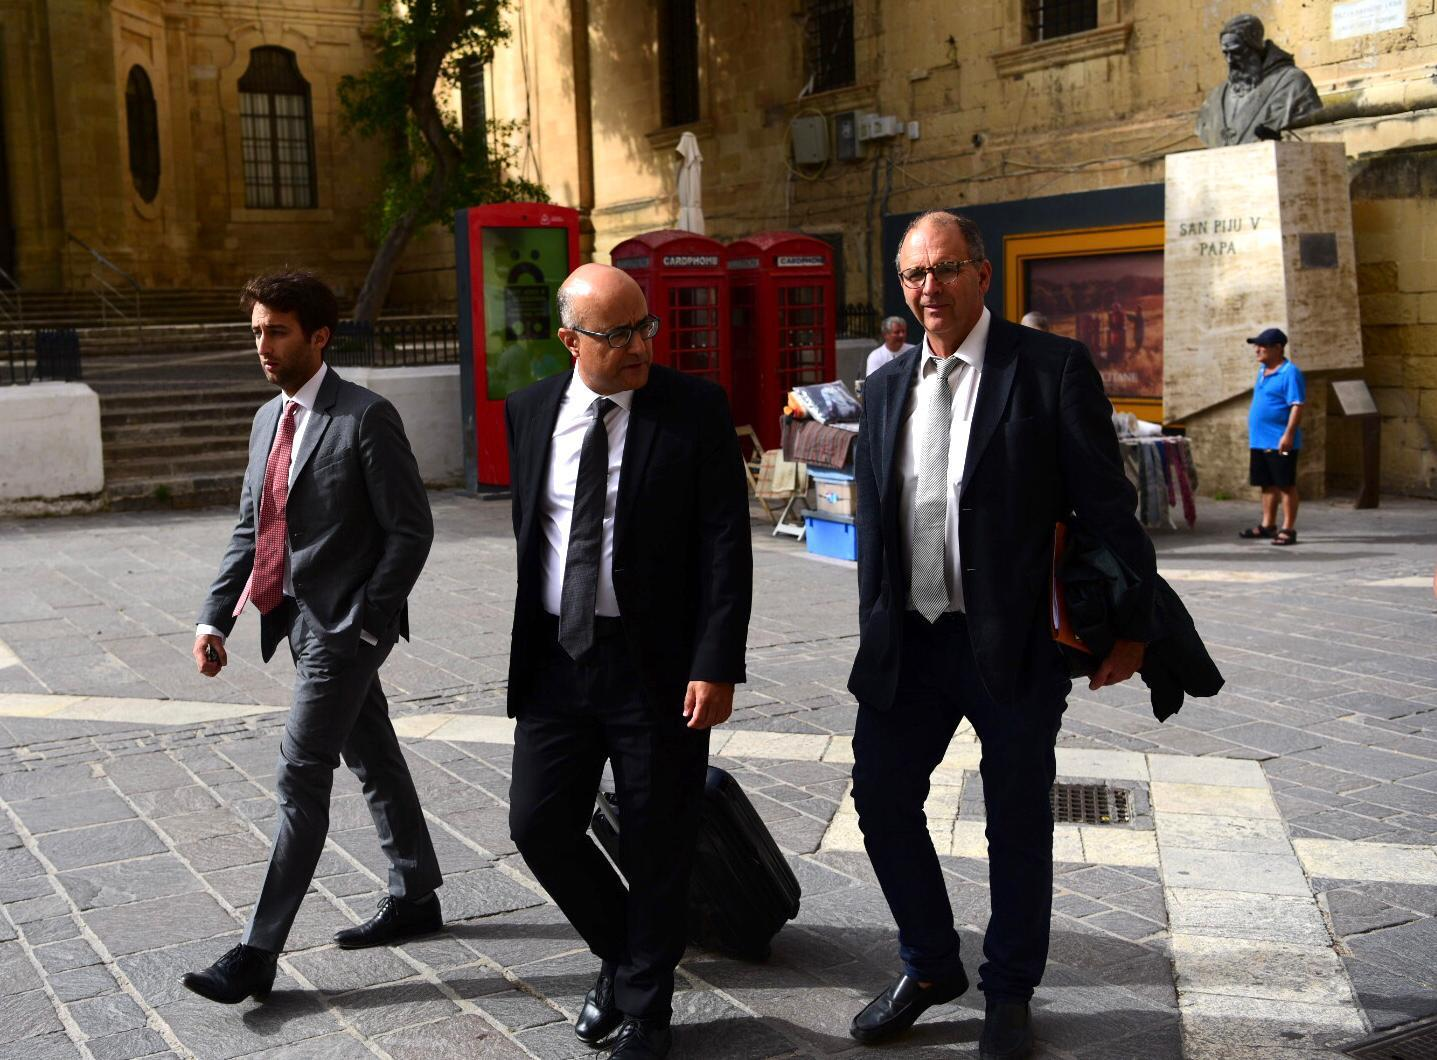 Matthew Caruana Galizia (left) and his father Peter (right) walk to court together with lawyer Jason Azzopardi last Monday. Photo: Mark Zammit Cordina